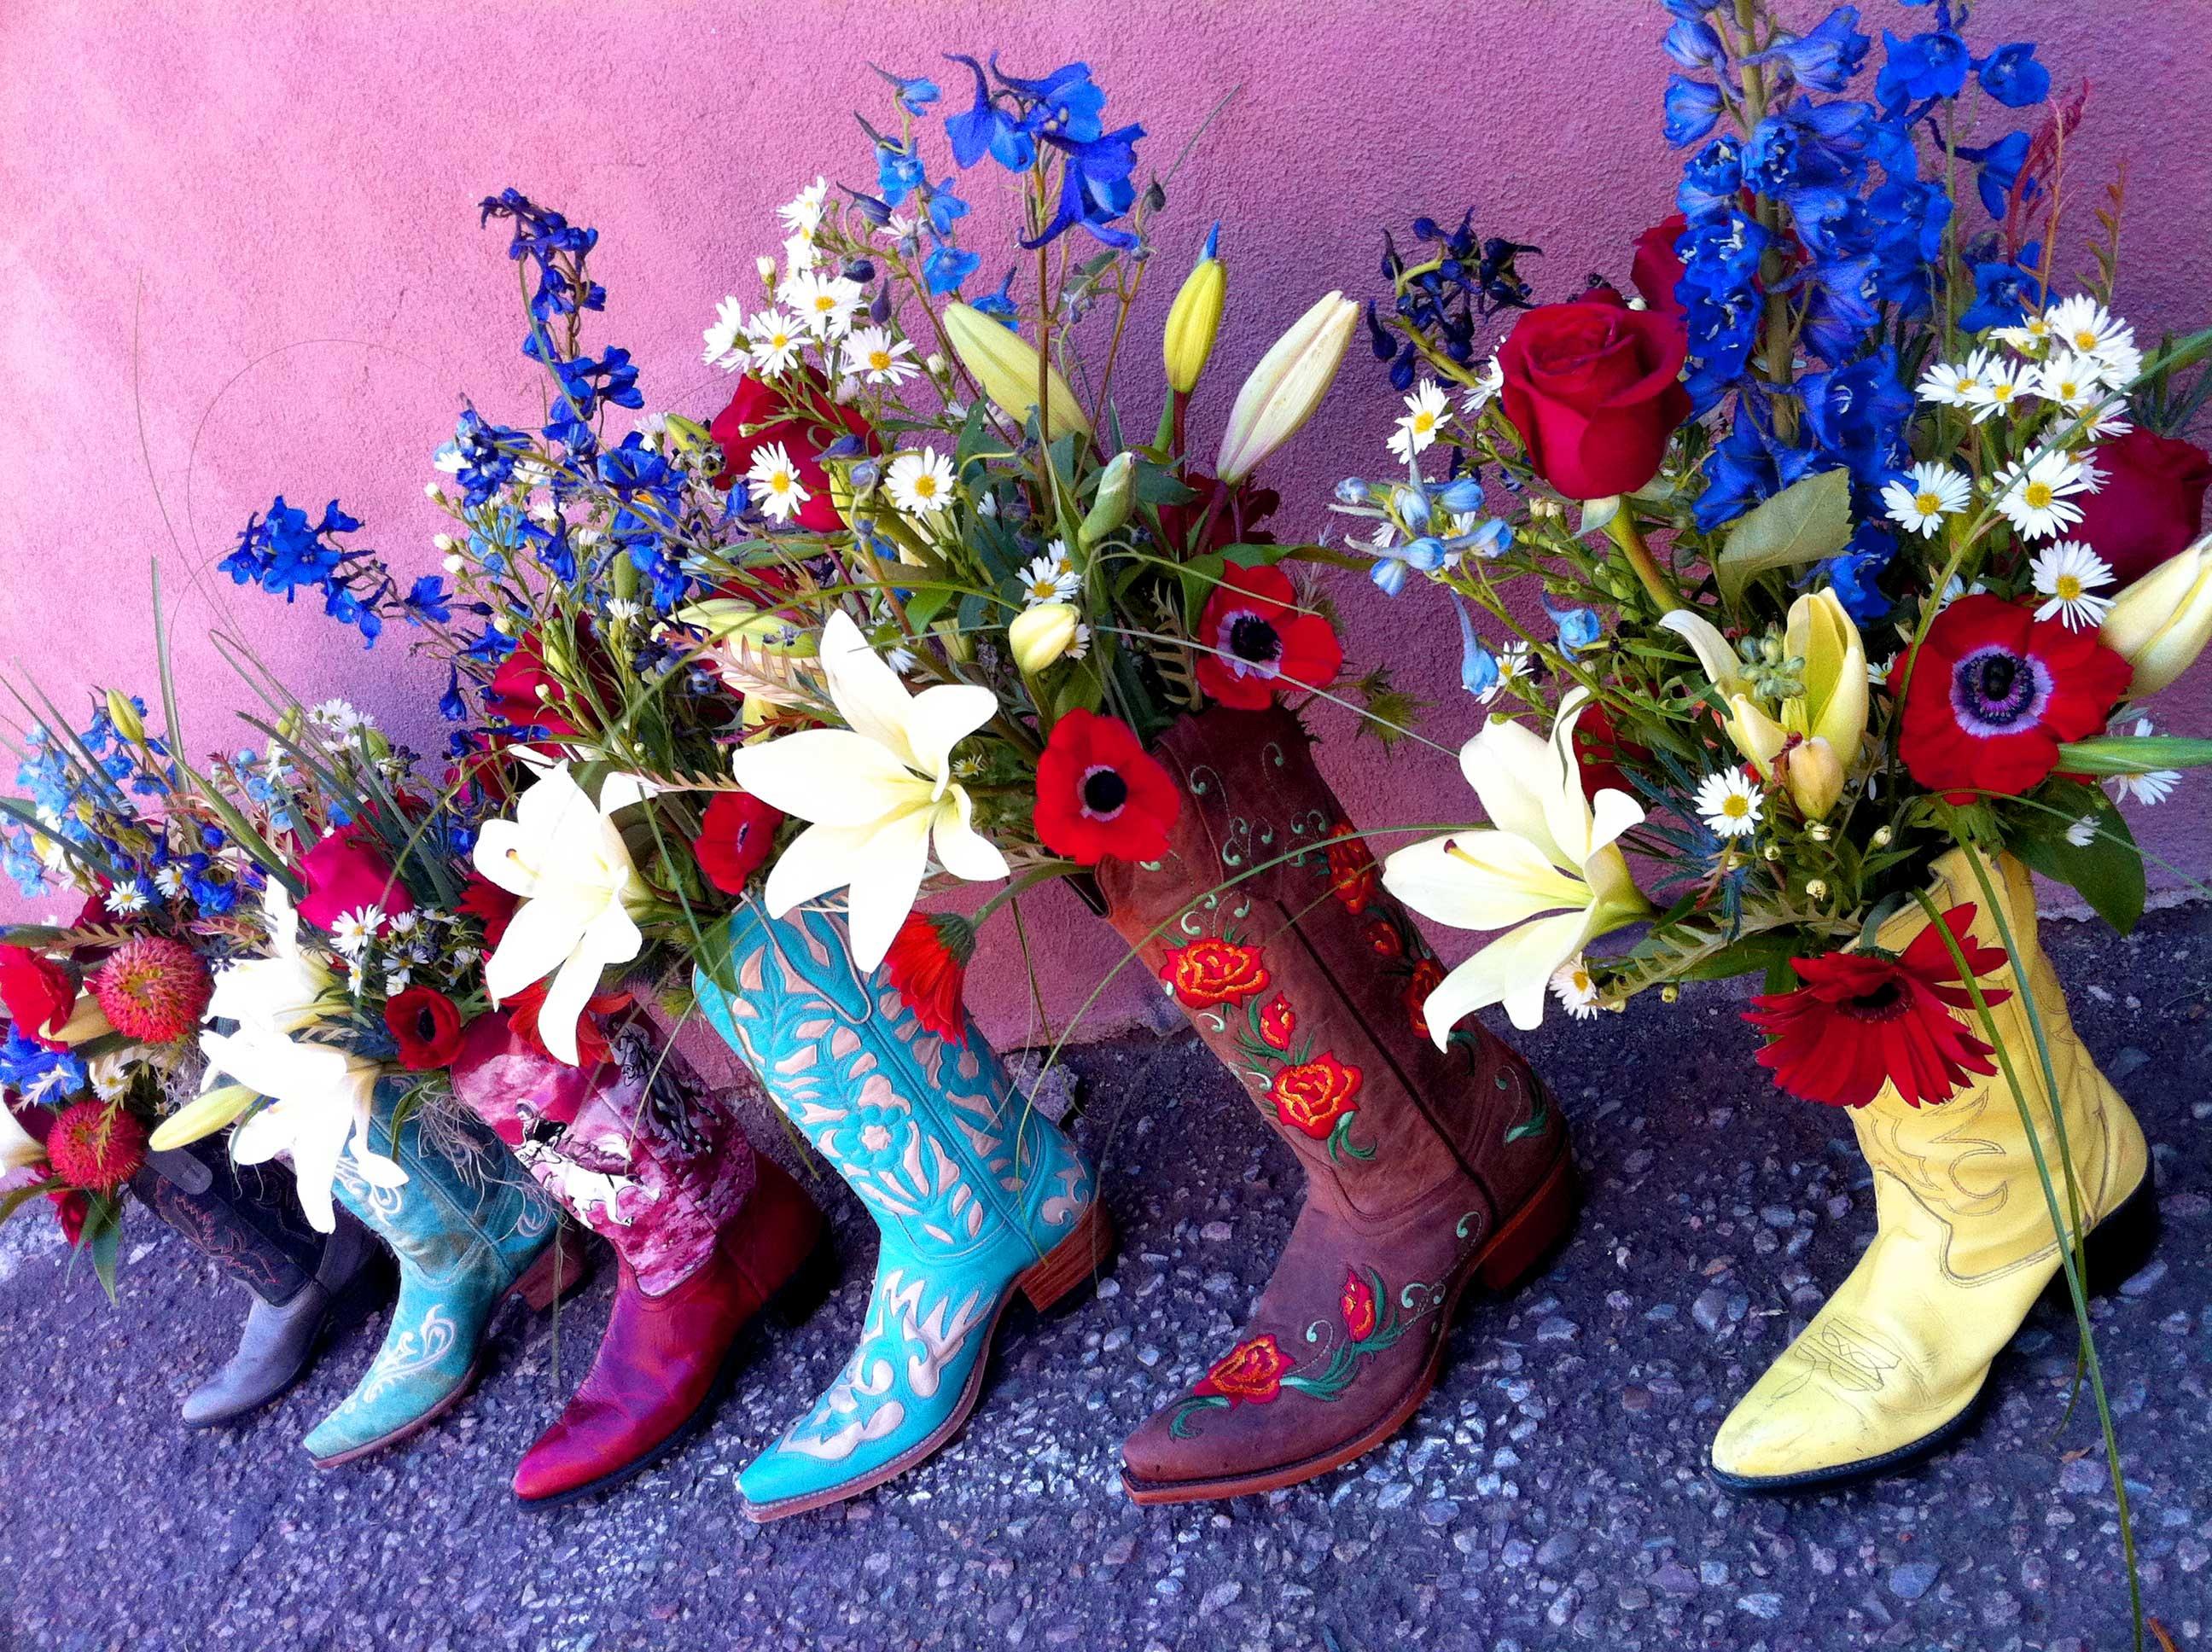 Flowers in Cowboy Boots HD Wallpaper